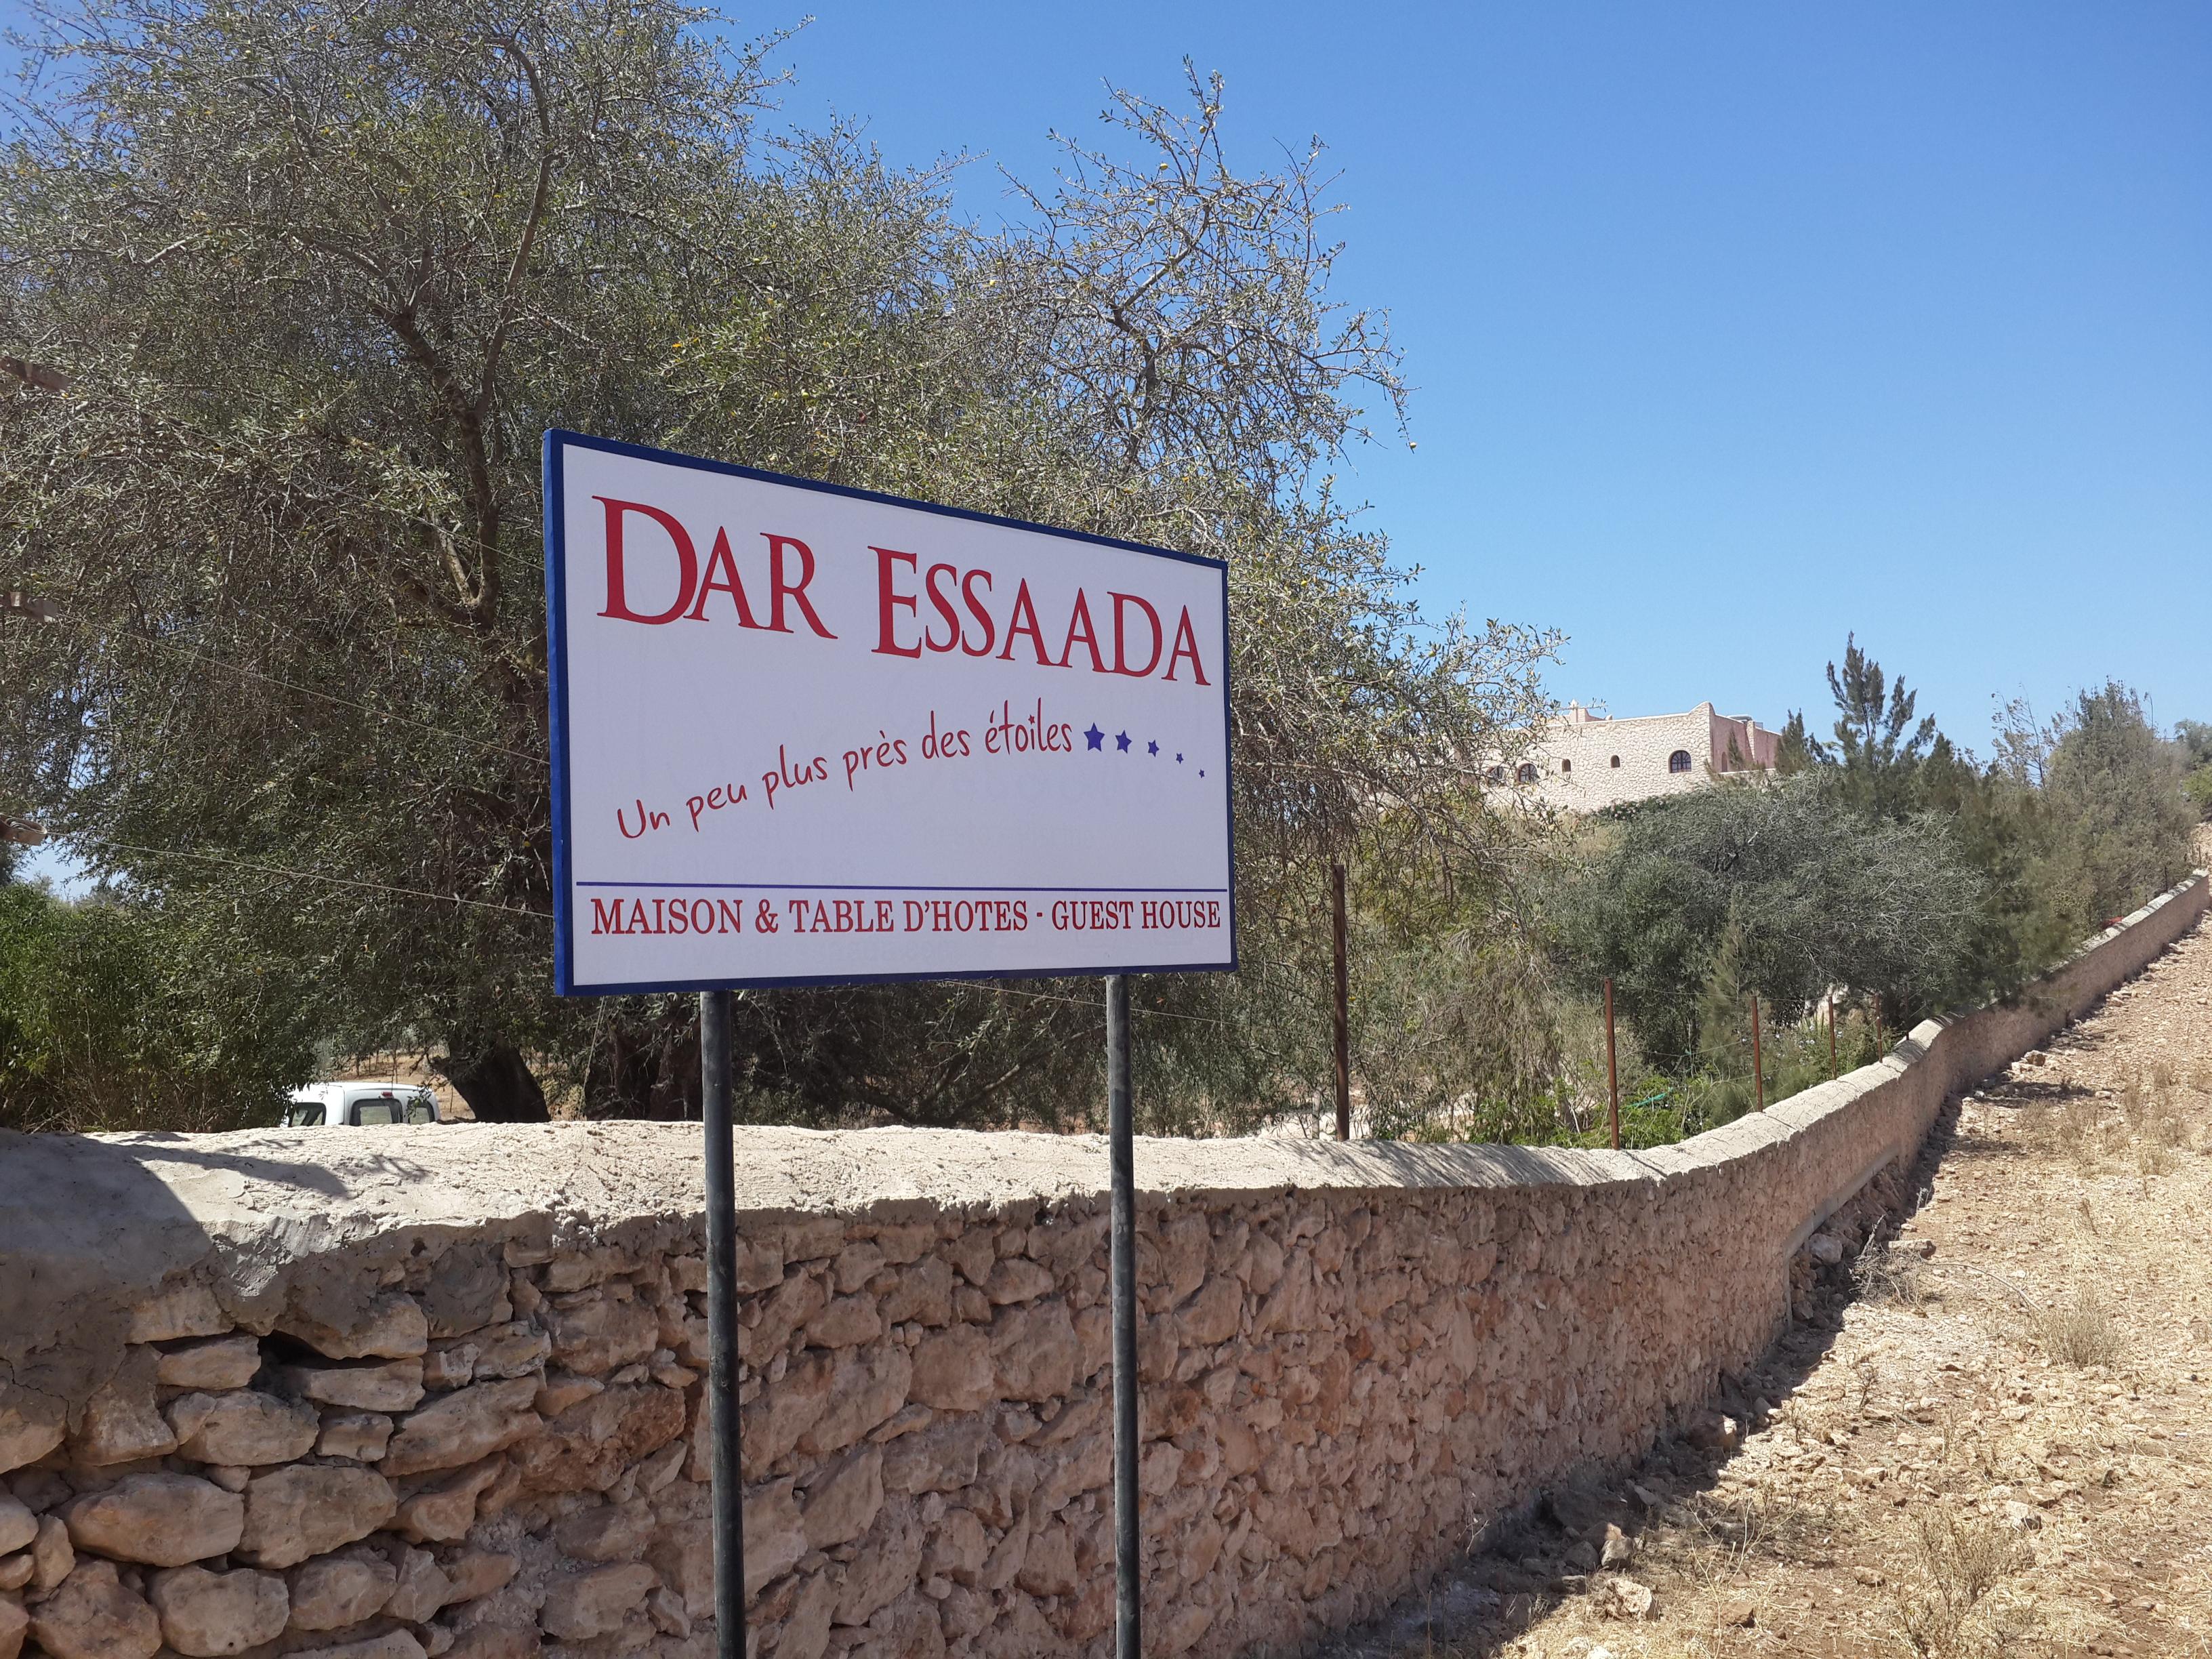 Dar Essaada